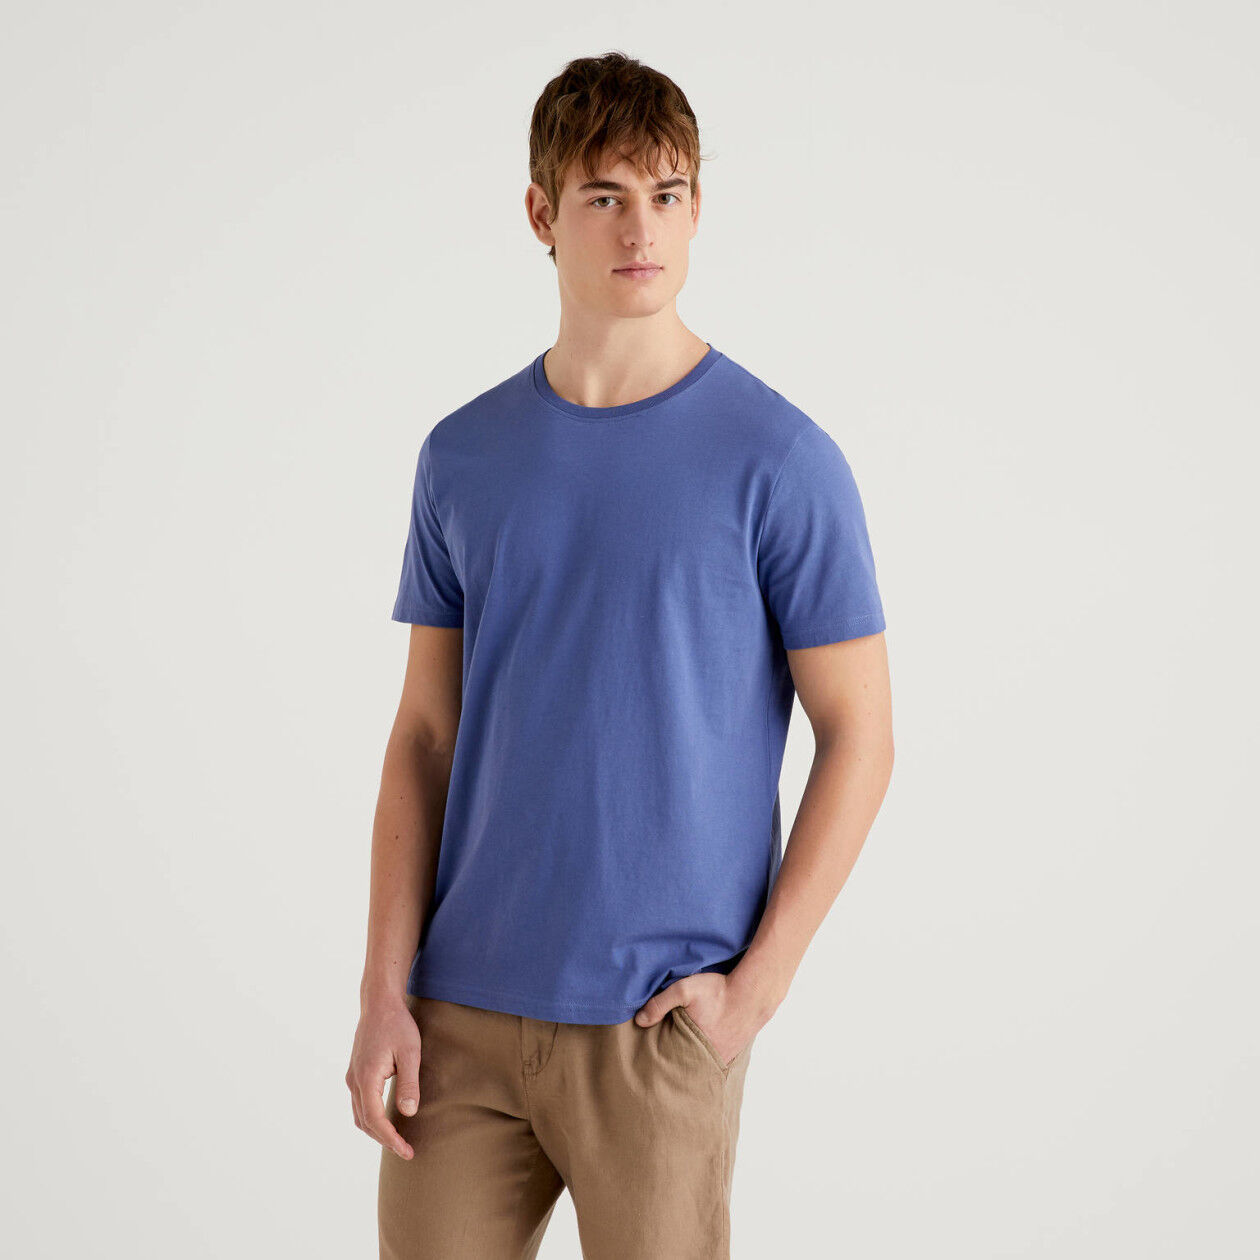 T-shirt bleu horizon en pur coton